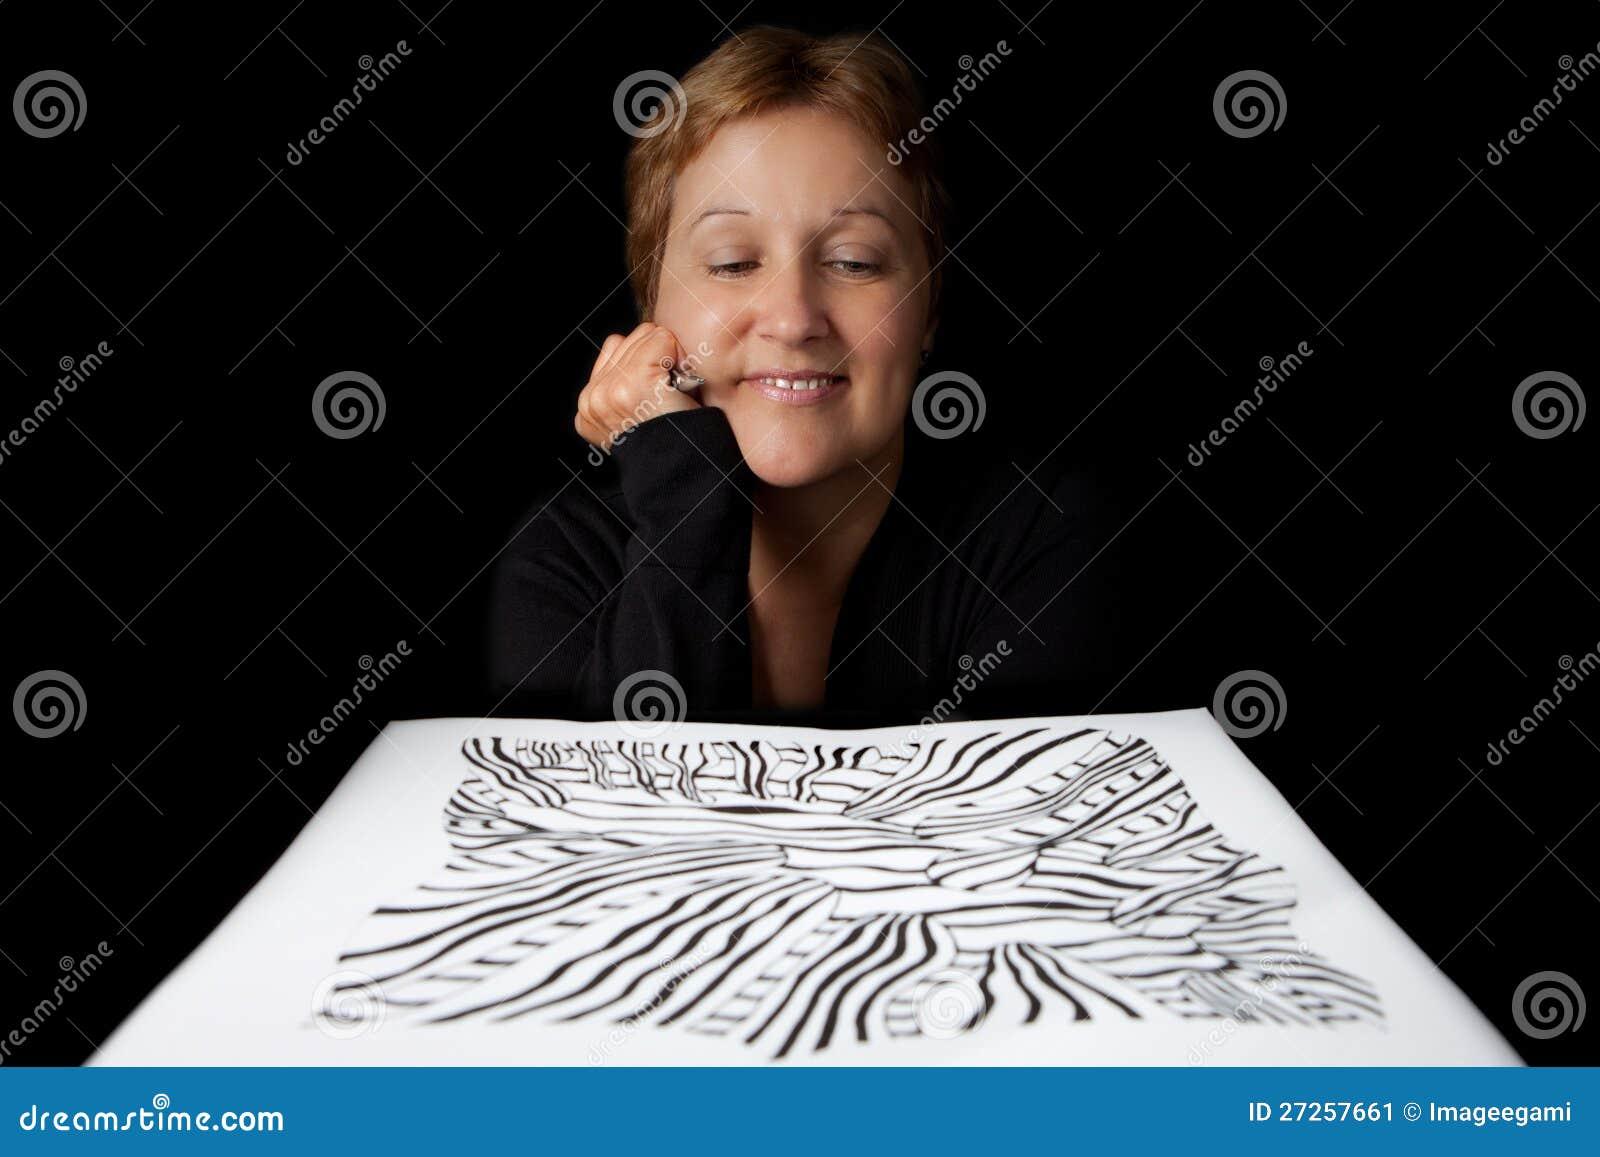 Artiste admirant son travail